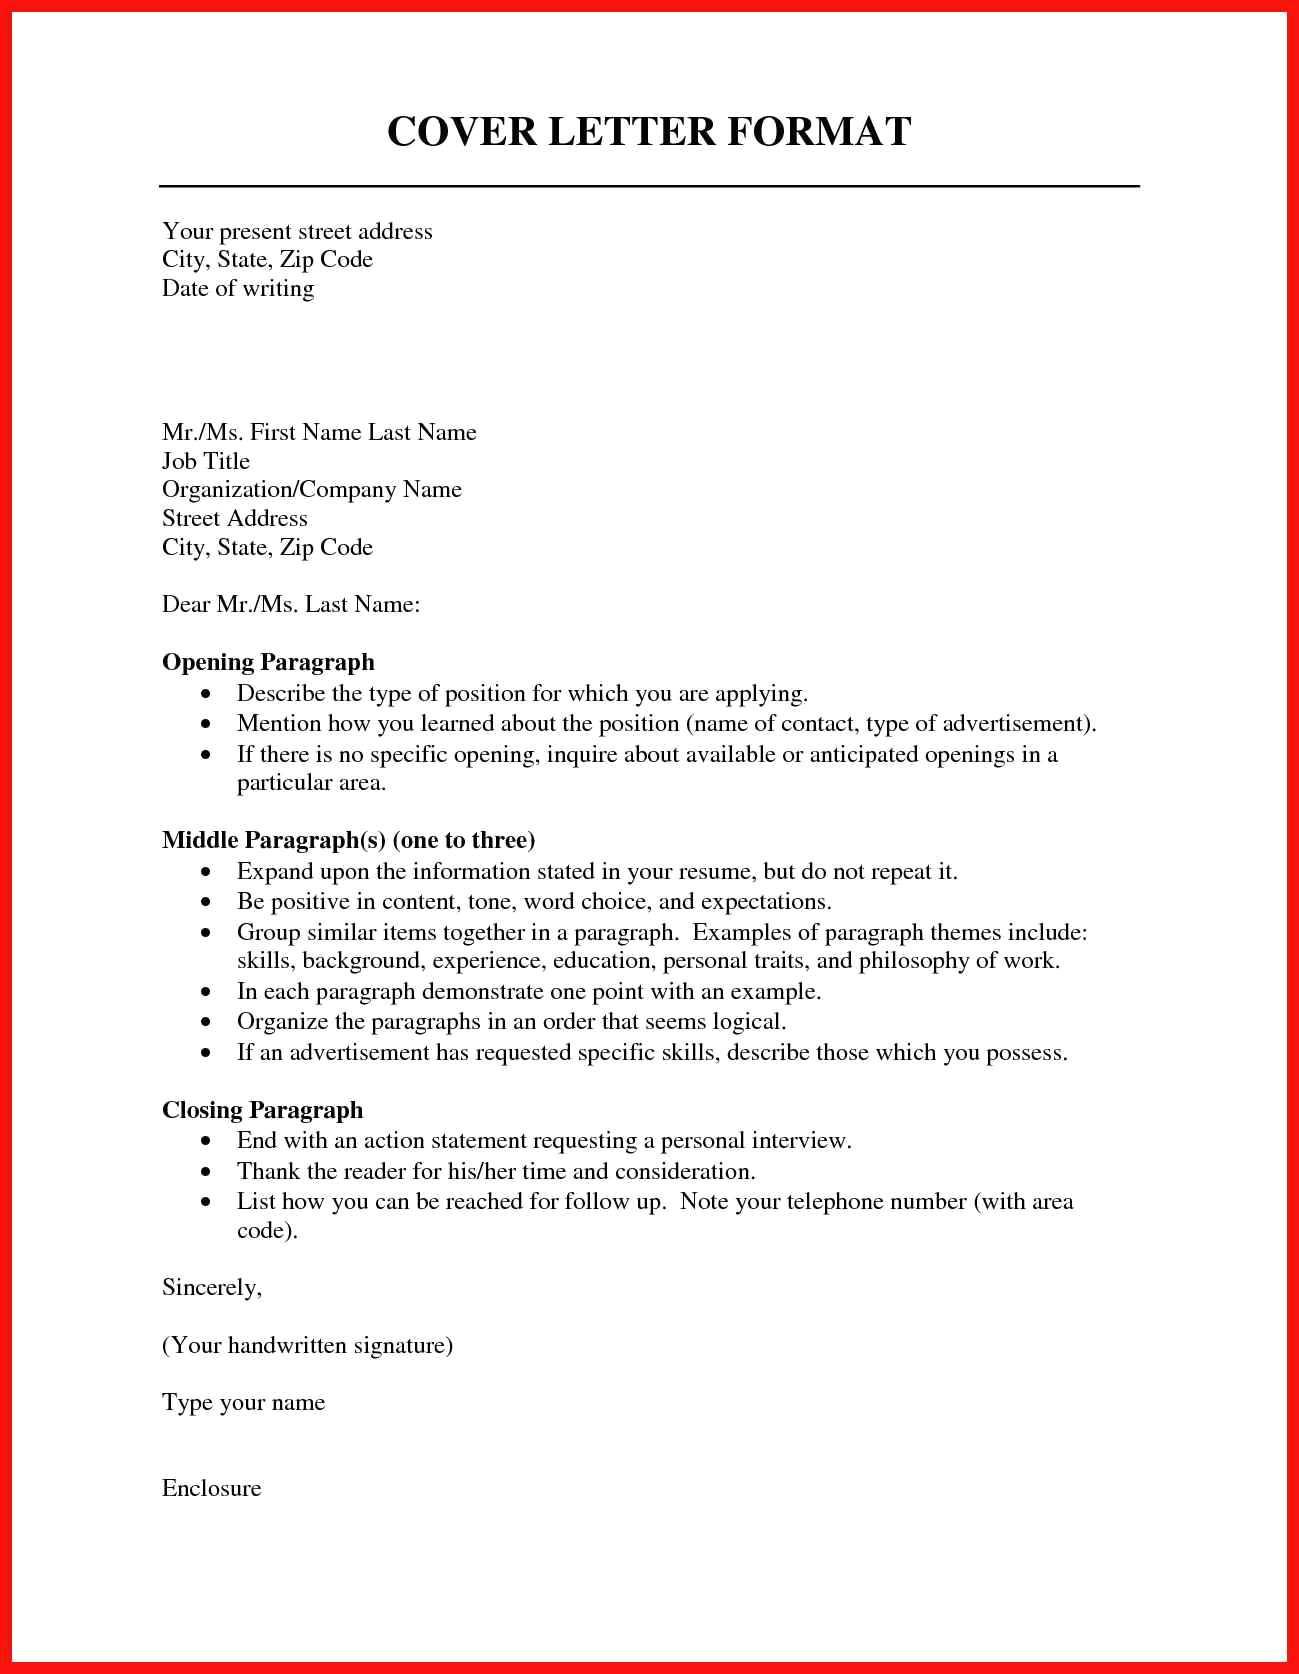 crummey-letter-template-12 Crummey Letter Template Maryland on